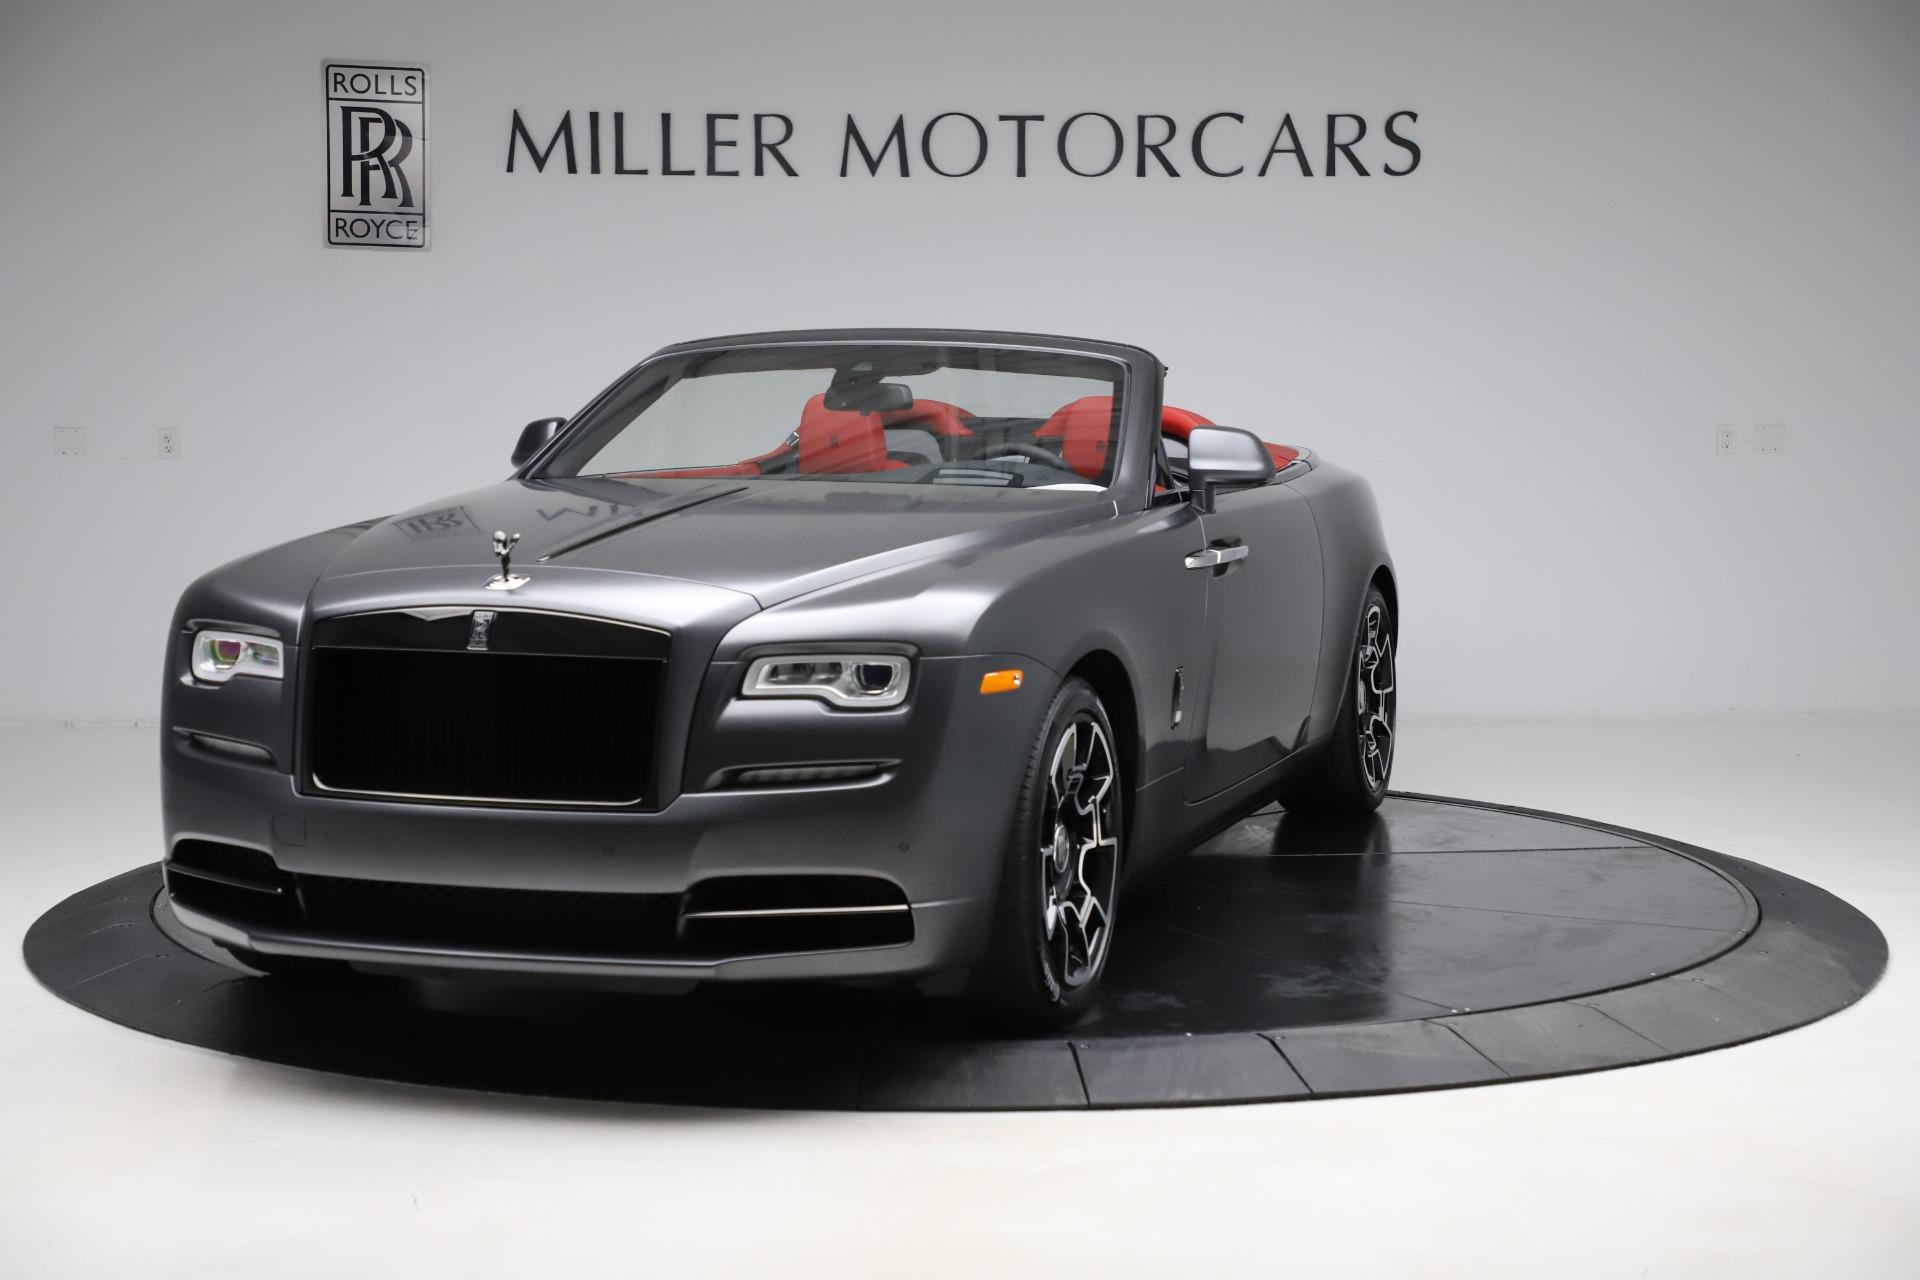 New 2020 Rolls-Royce Dawn Black Badge for sale $477,975 at Bugatti of Greenwich in Greenwich CT 06830 1